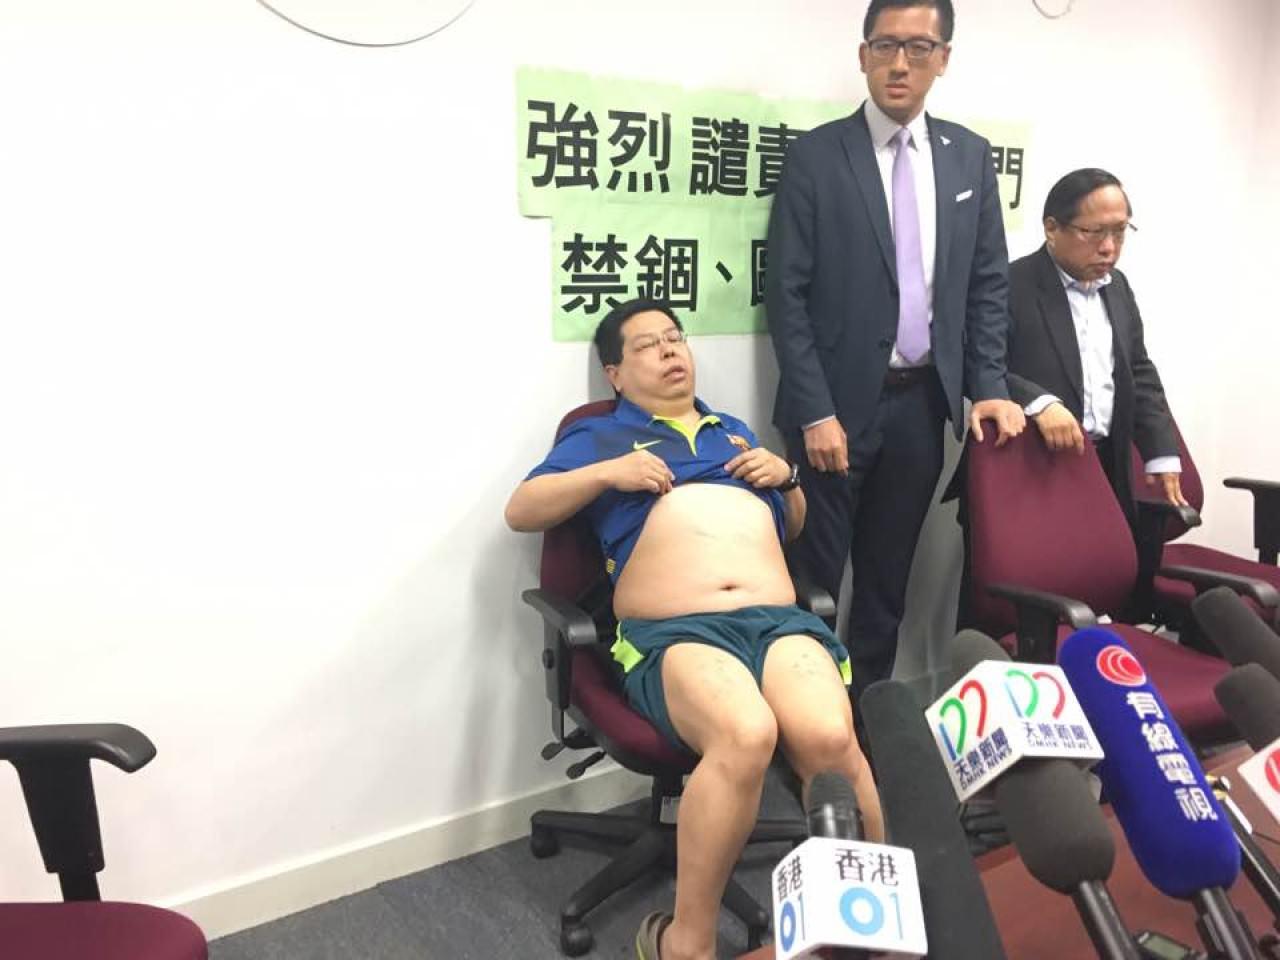 [img]https://cdn.hk01.com/media/images/760114/xlarge/fae5763e766a43ae9b10fe1e1de4d5f9.jpg[/img]